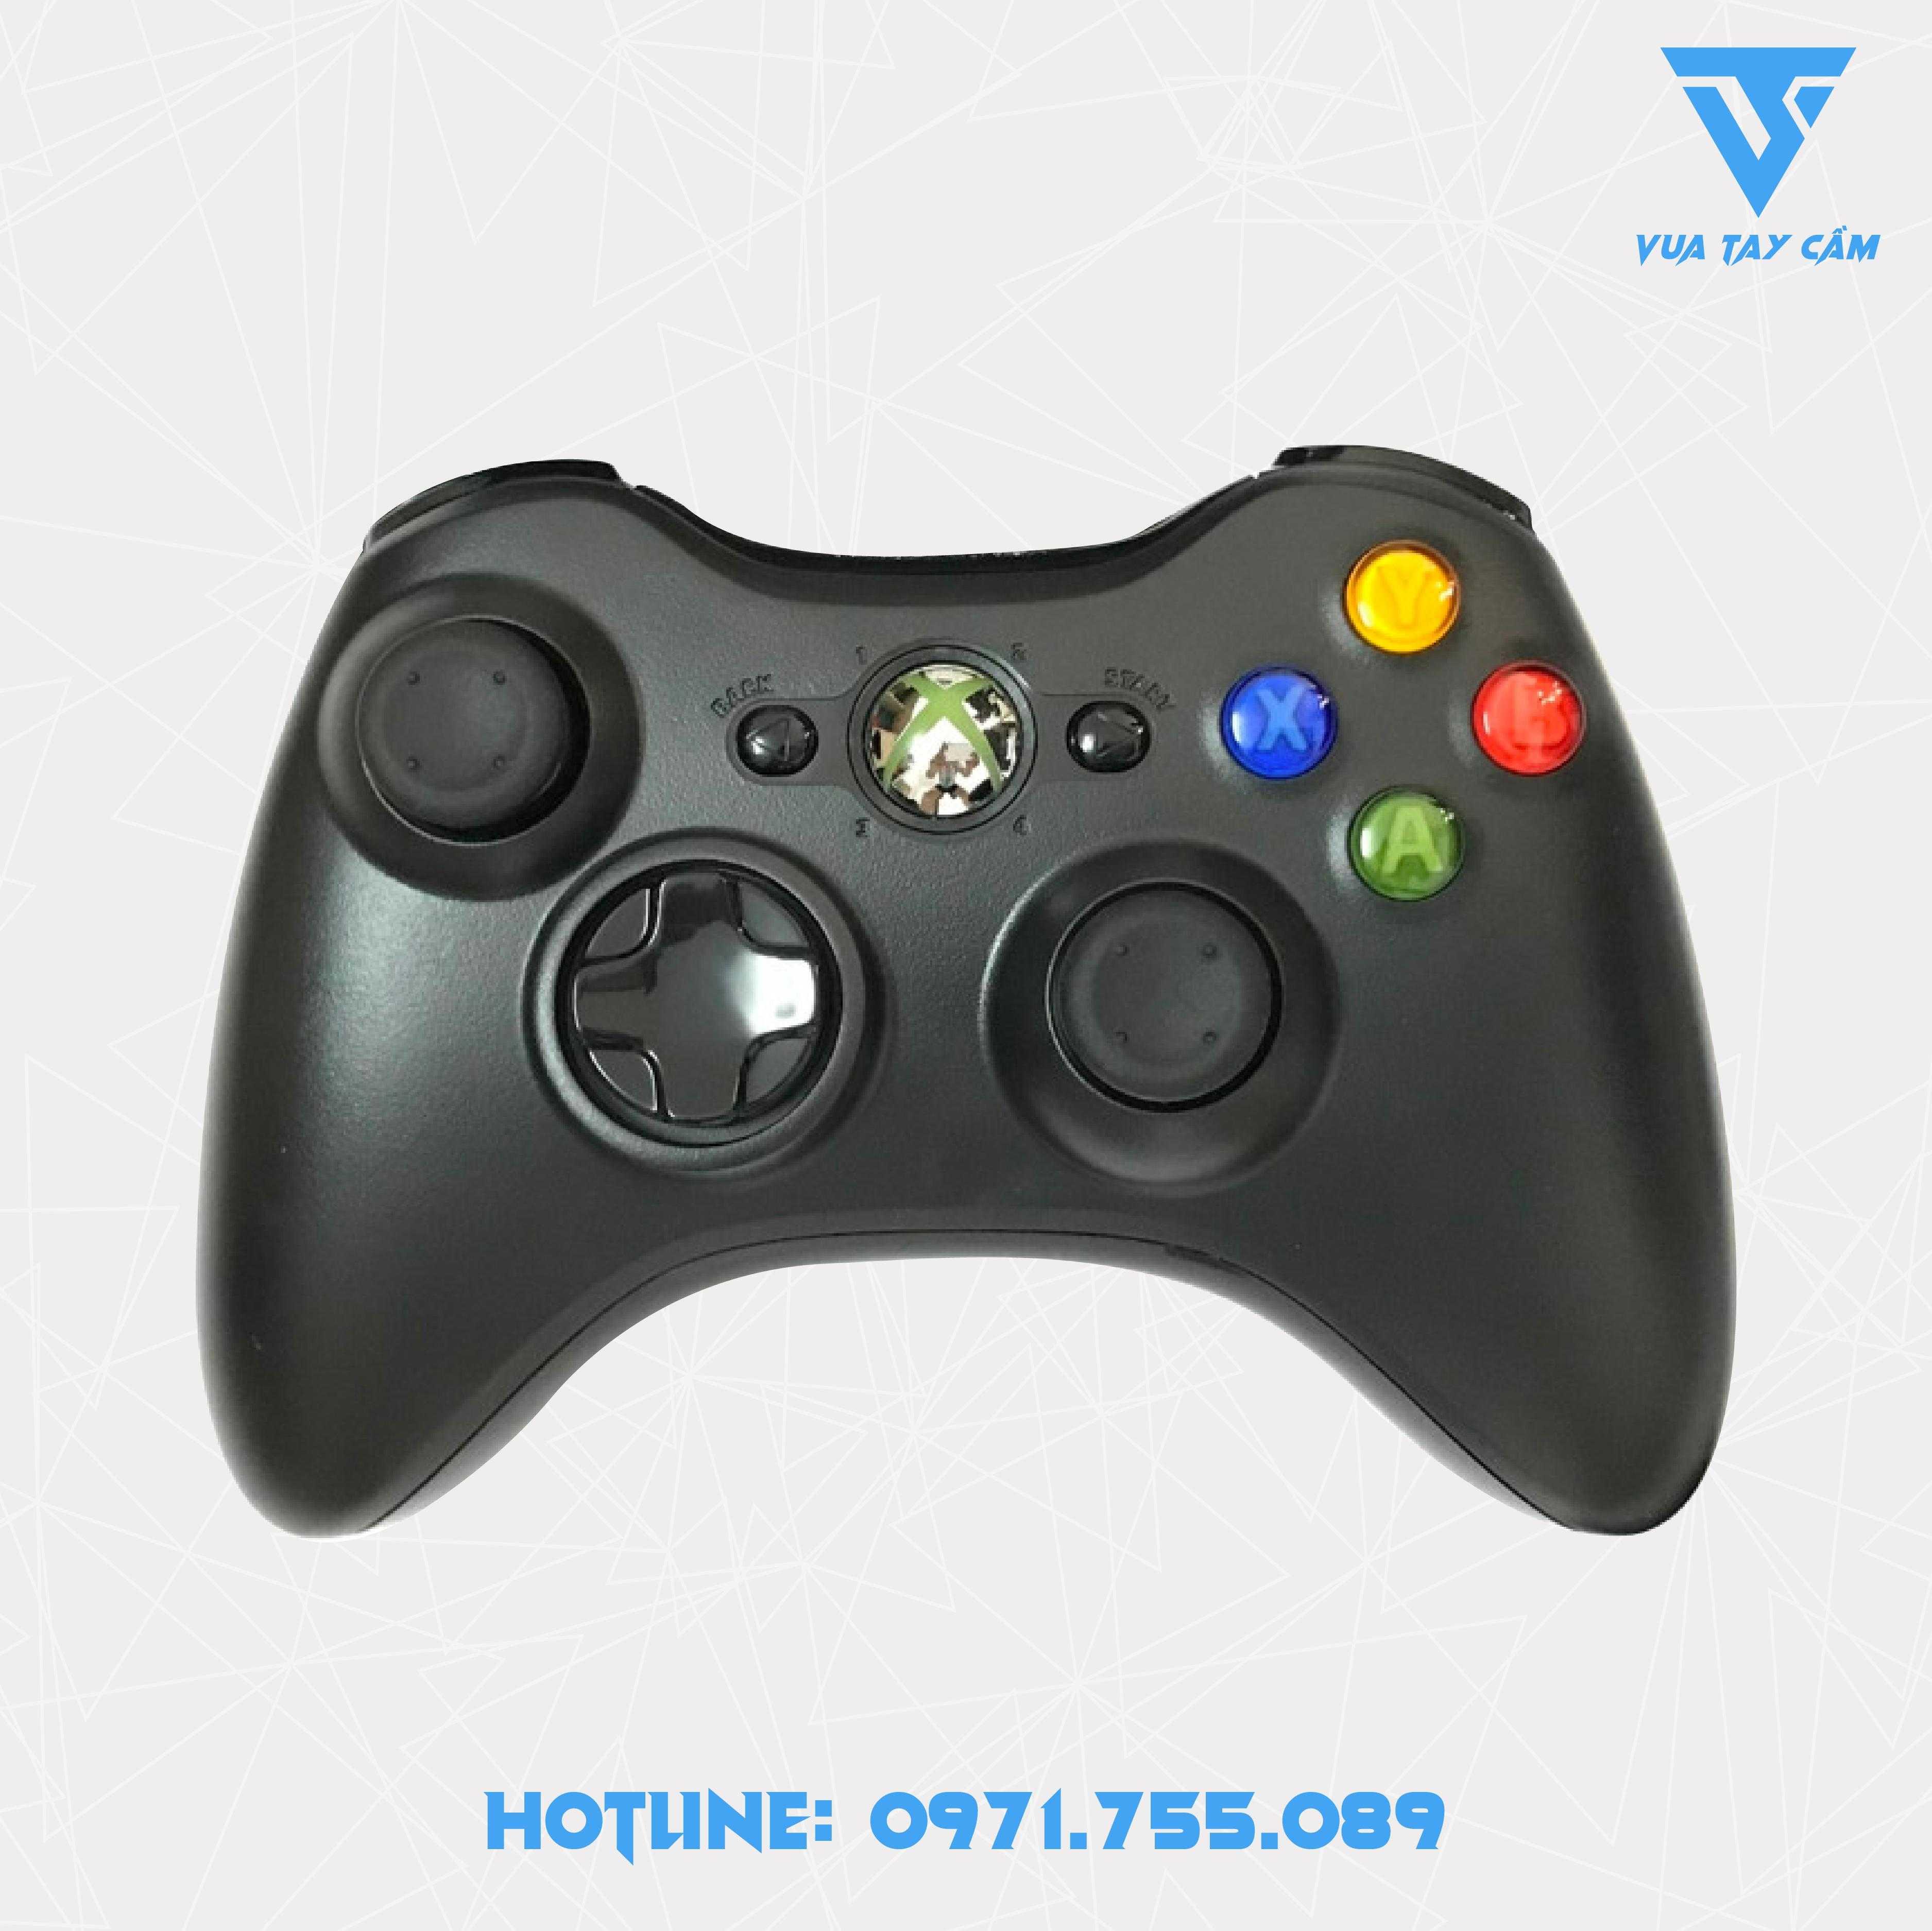 https://api.vuataycam.com/file/1602859782322-383943509-xbox-360-khongday-8.jpg